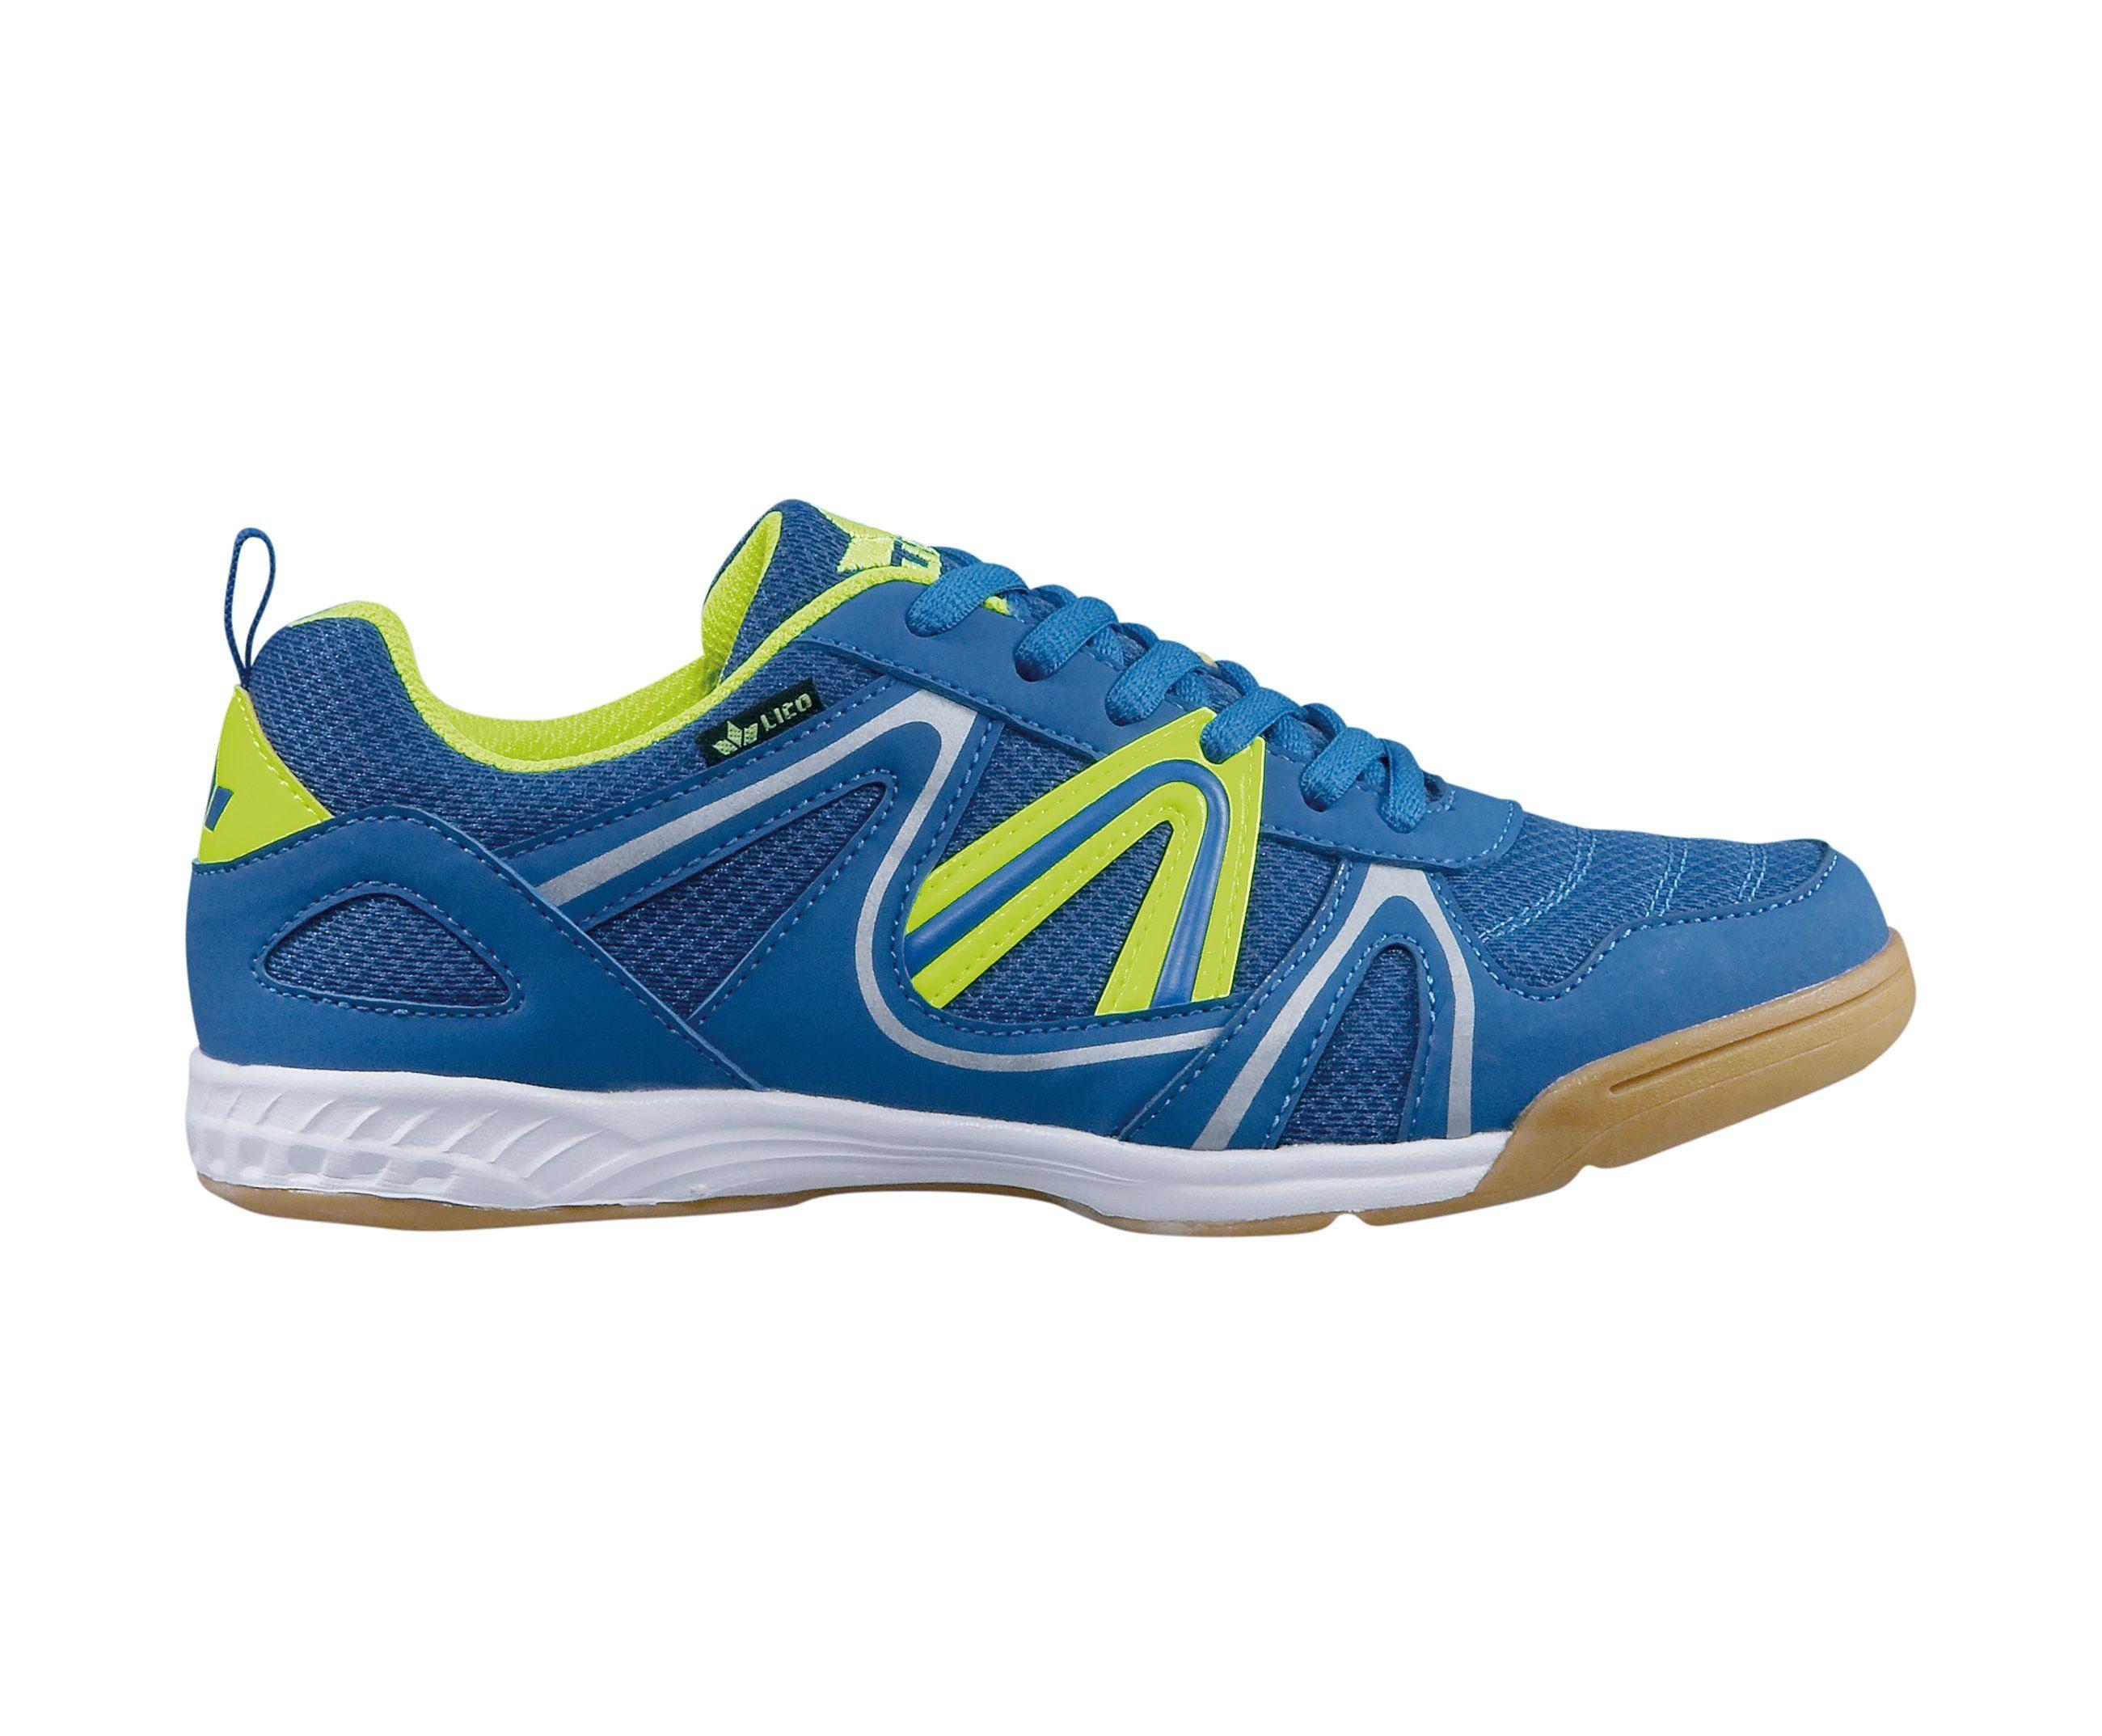 Lico Sportschuh Fit Indoor blau#ft5_slash#lemon Laufschuh  blau